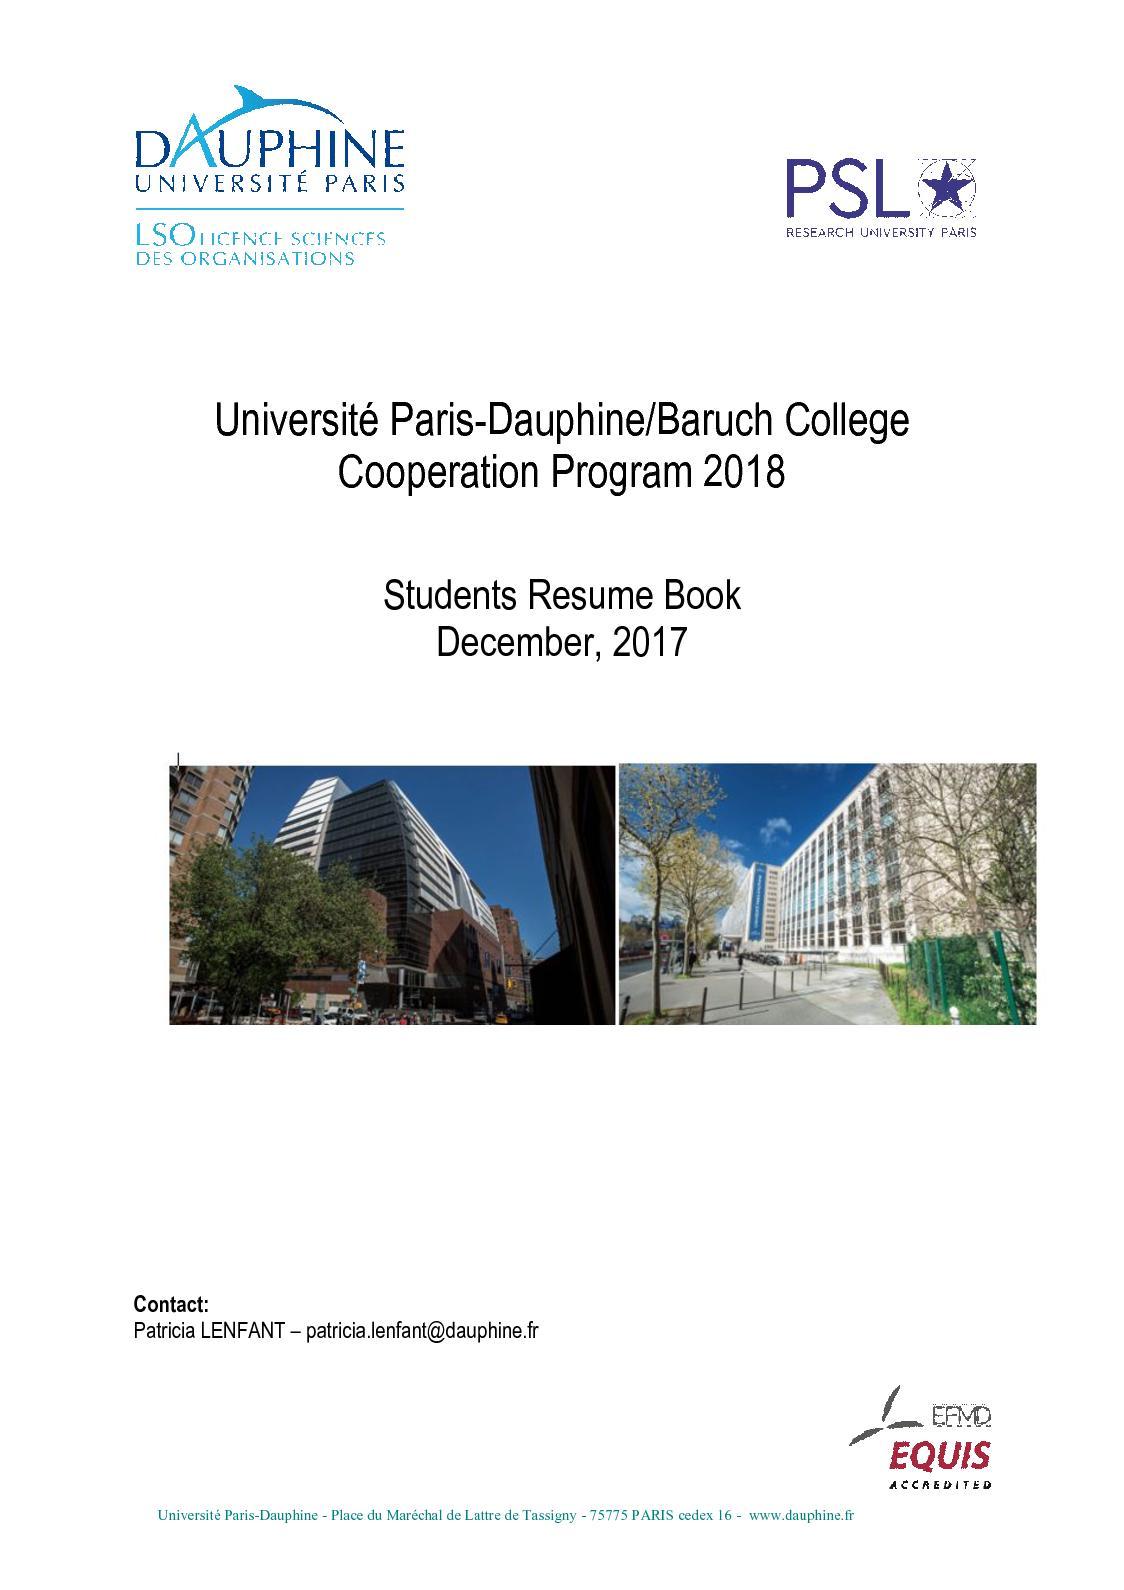 Calamo Baruch Dauphine Book Of Resume 2018